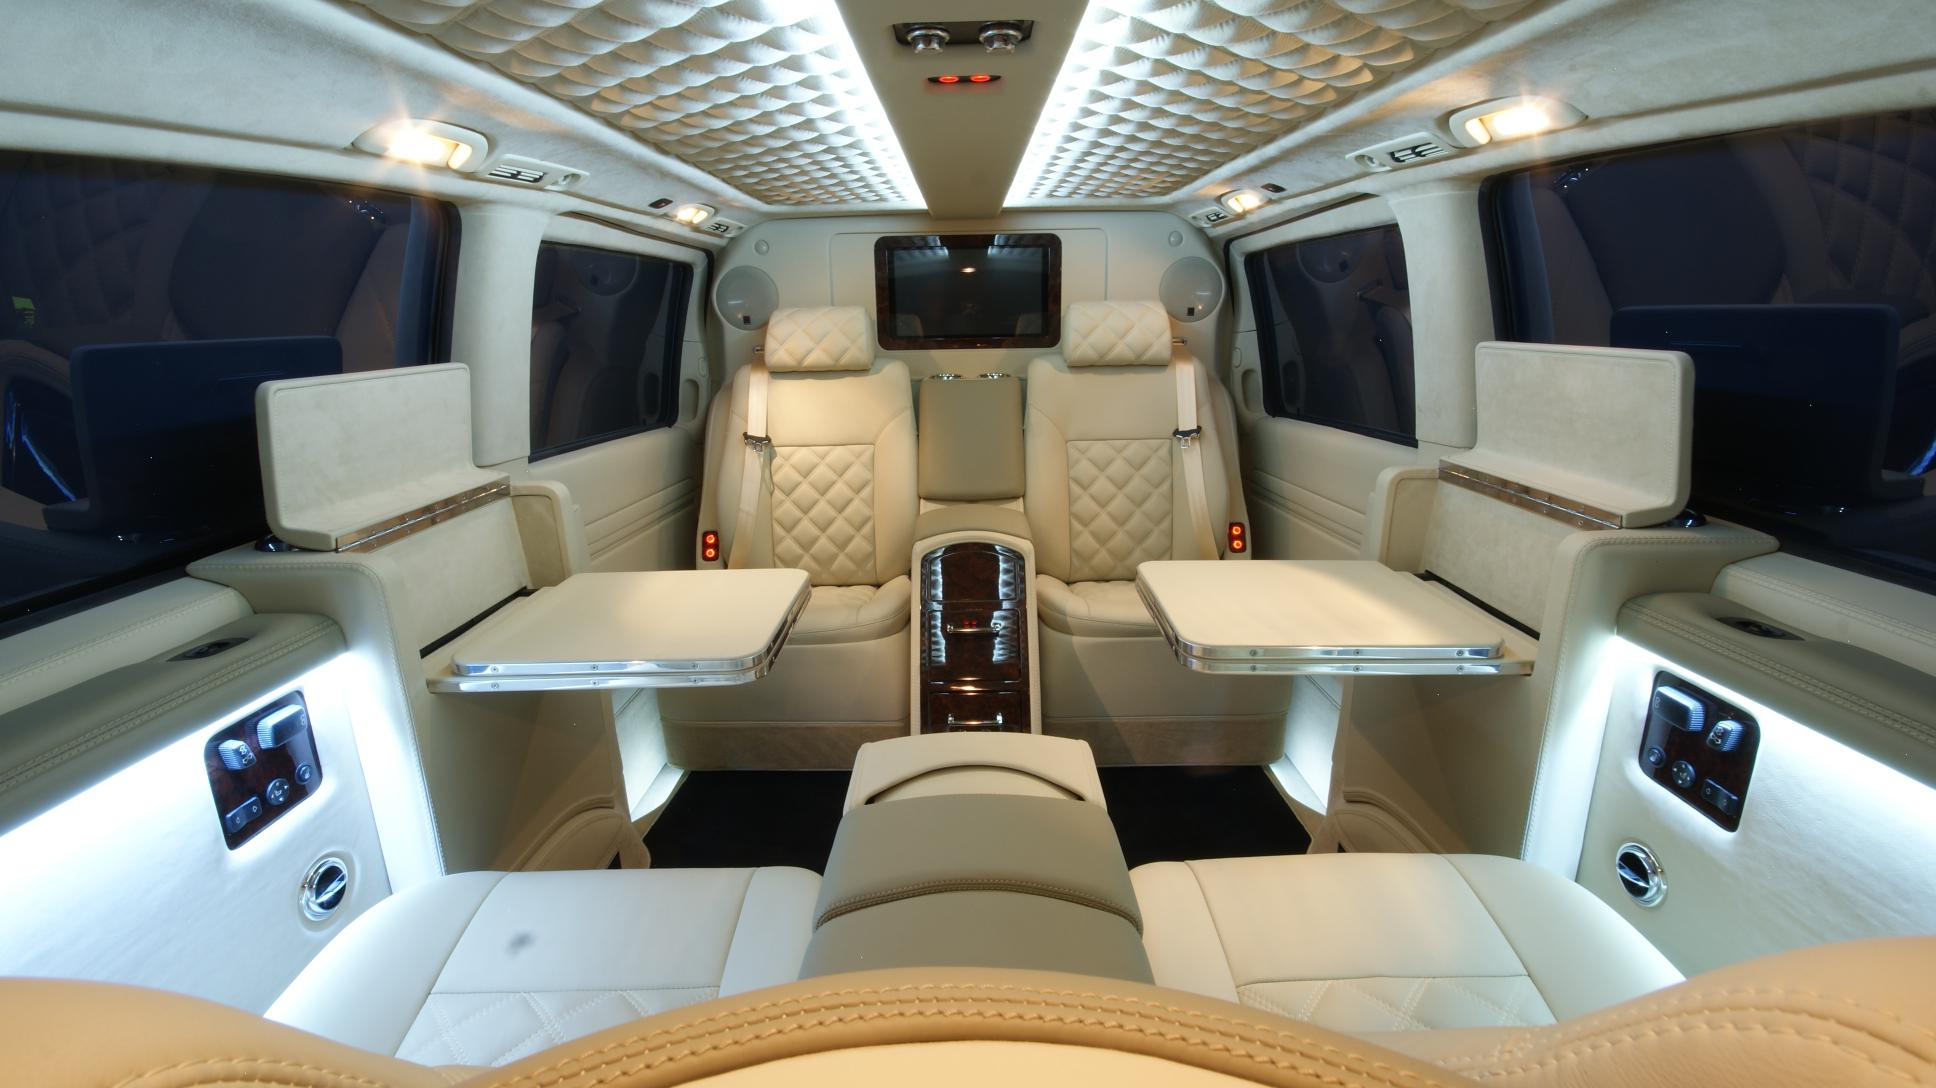 Mercedes Viano by Carisma Auto Design Is the Ultimate